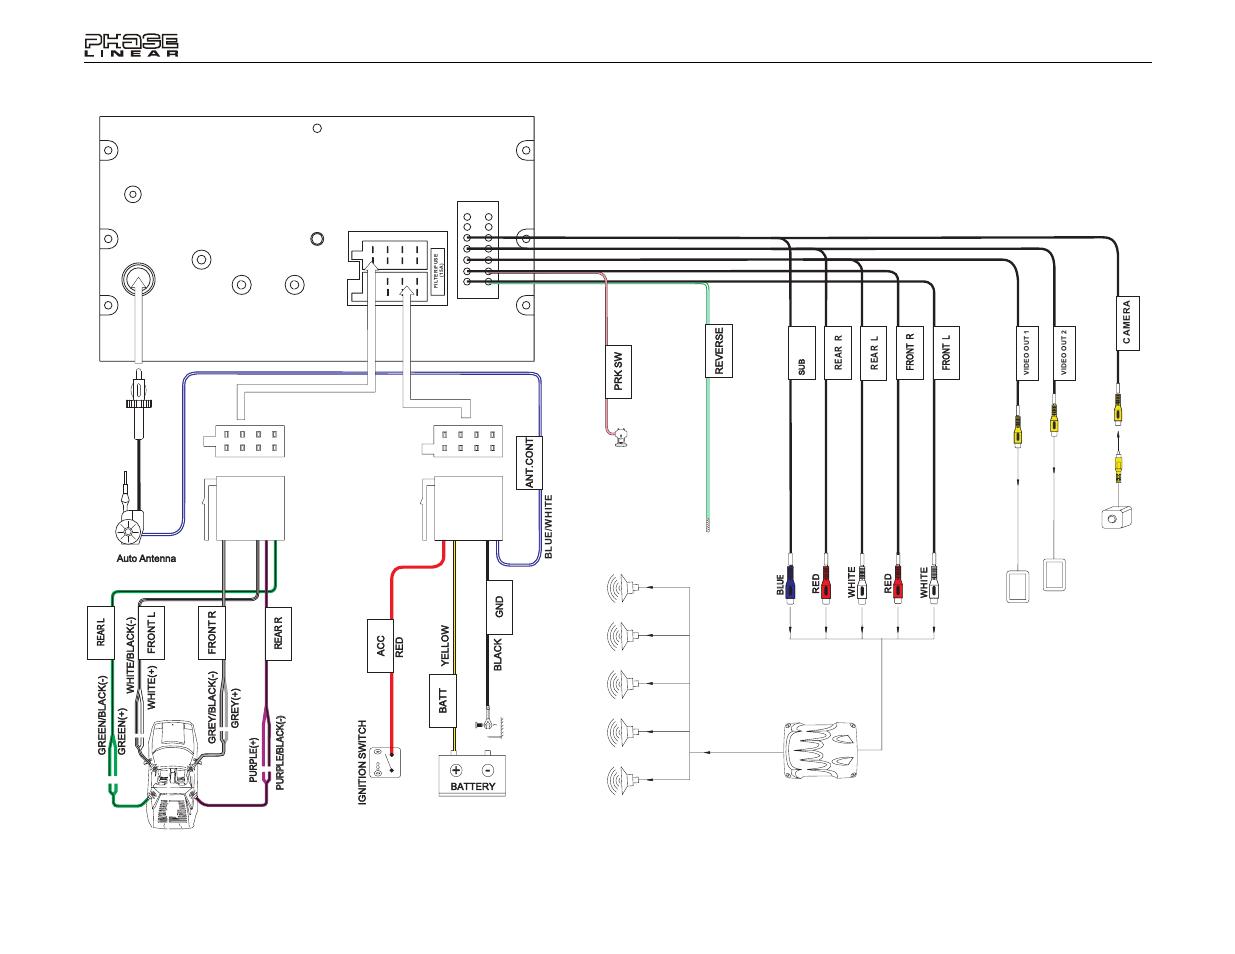 Uv8020, Wiring diagram | Jensen Phase Linear UV8020 User Manual | Page 8 /  30